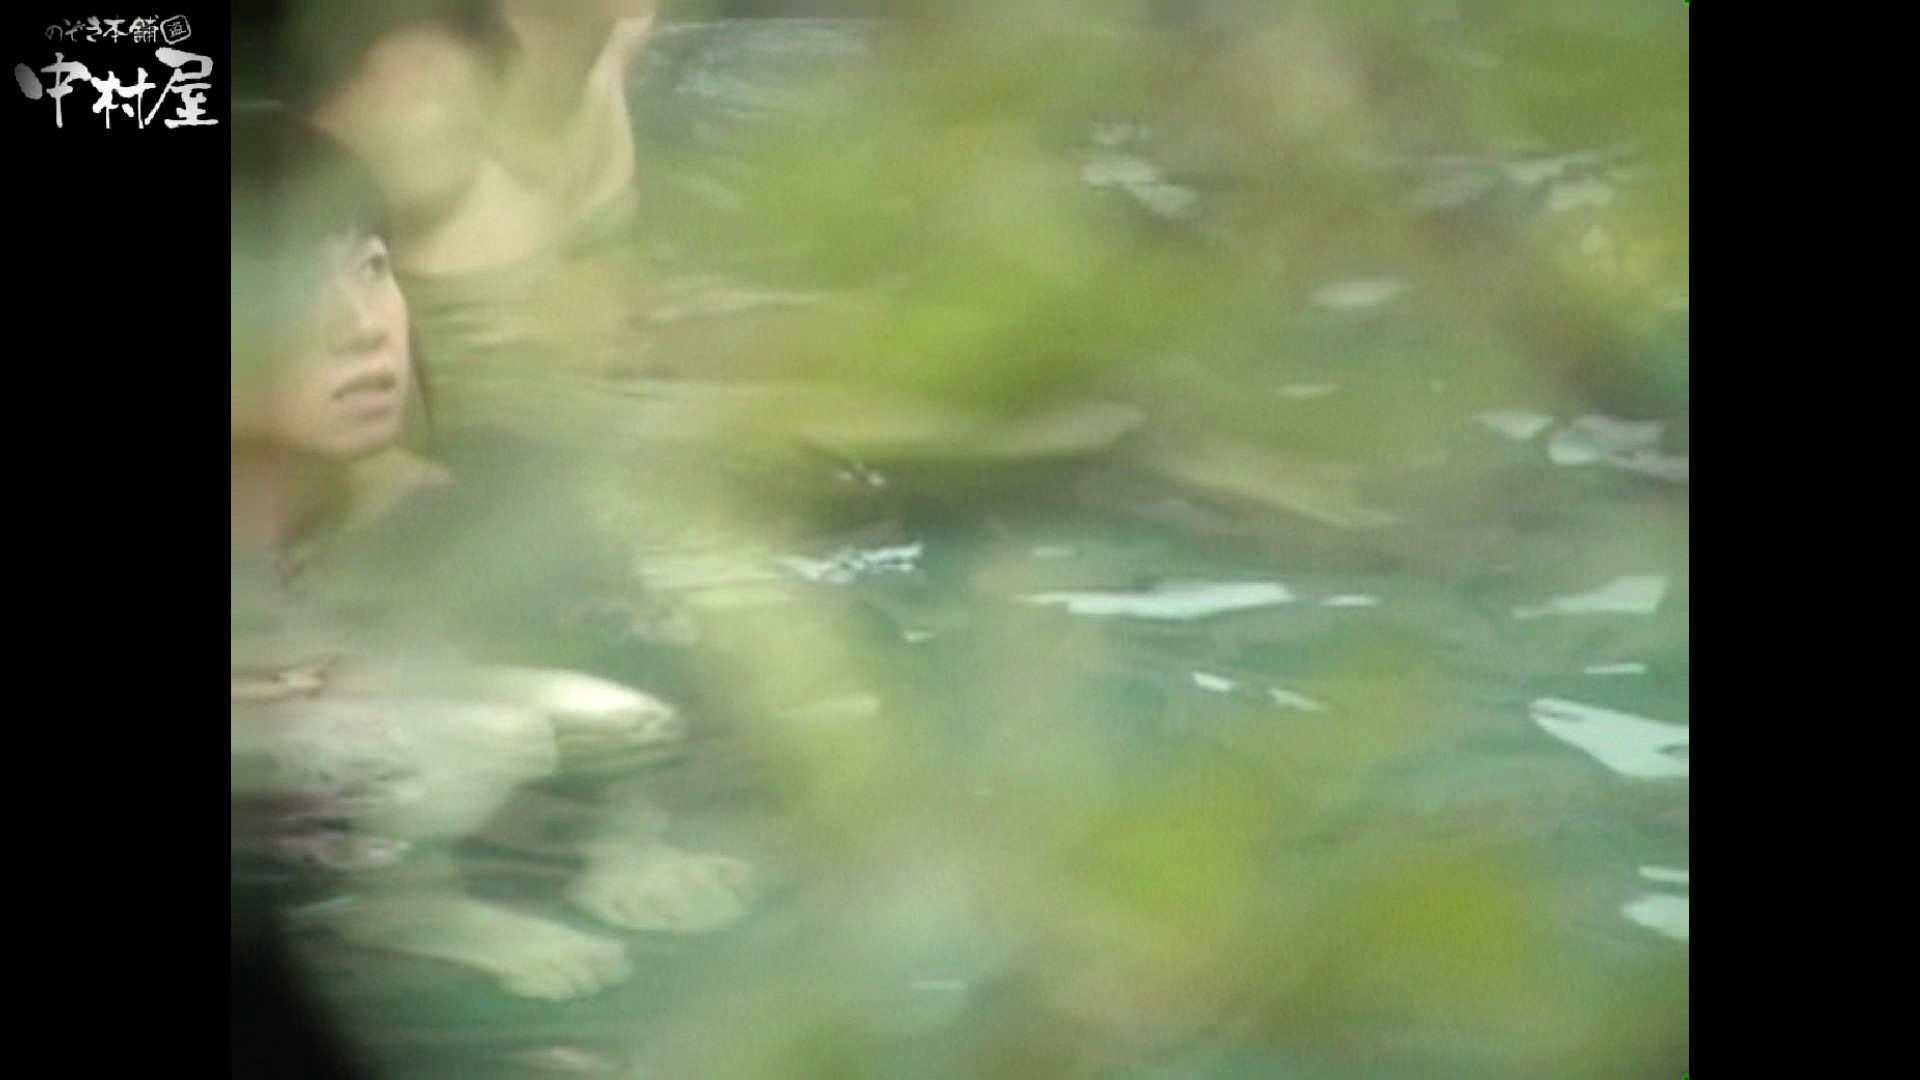 Aquaな露天風呂Vol.953 OLのエロ生活   露天風呂  107連発 34